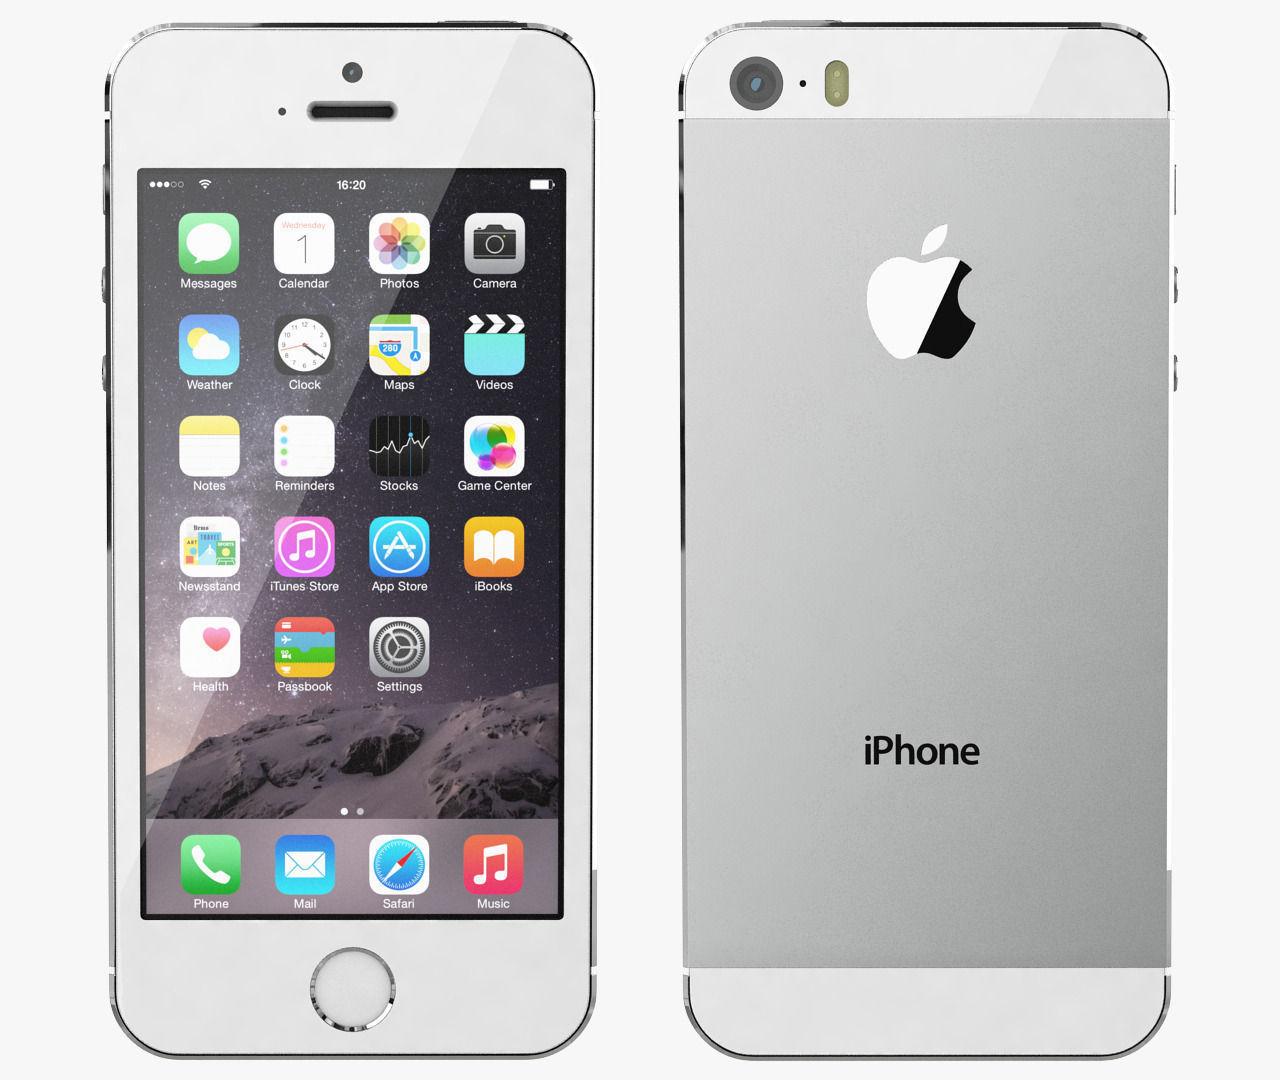 Wonderbaarlijk Apple iPhone 5S 16GB used iphones for sale from smartphonedepartment AT-43